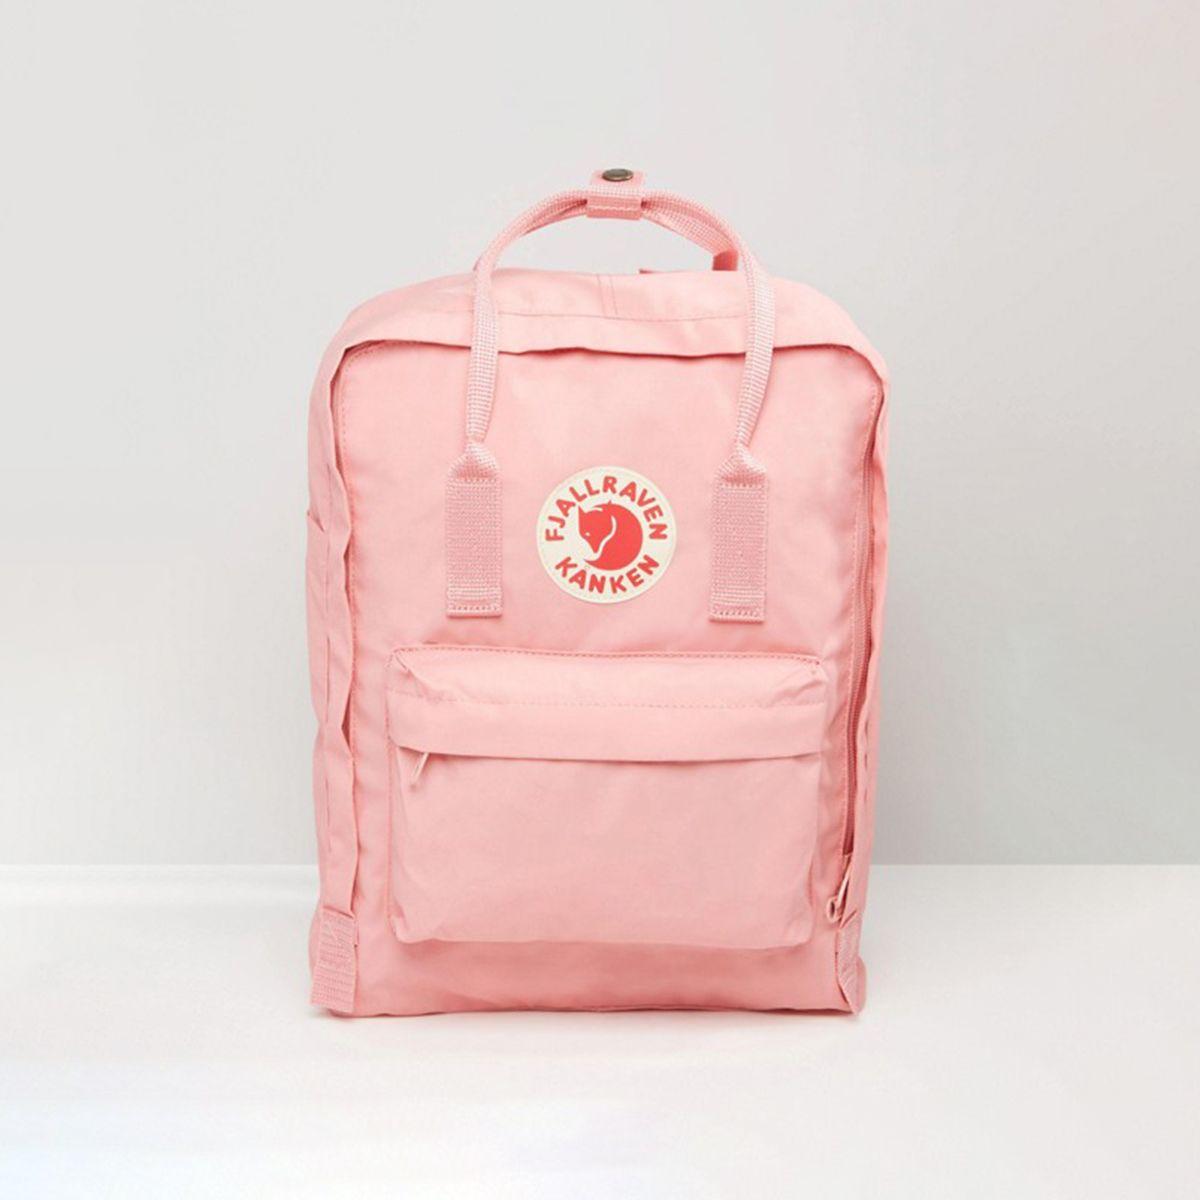 The Best Scandinavian Backpacks To Buy Now In 2020 Pink Backpack Bags Kanken